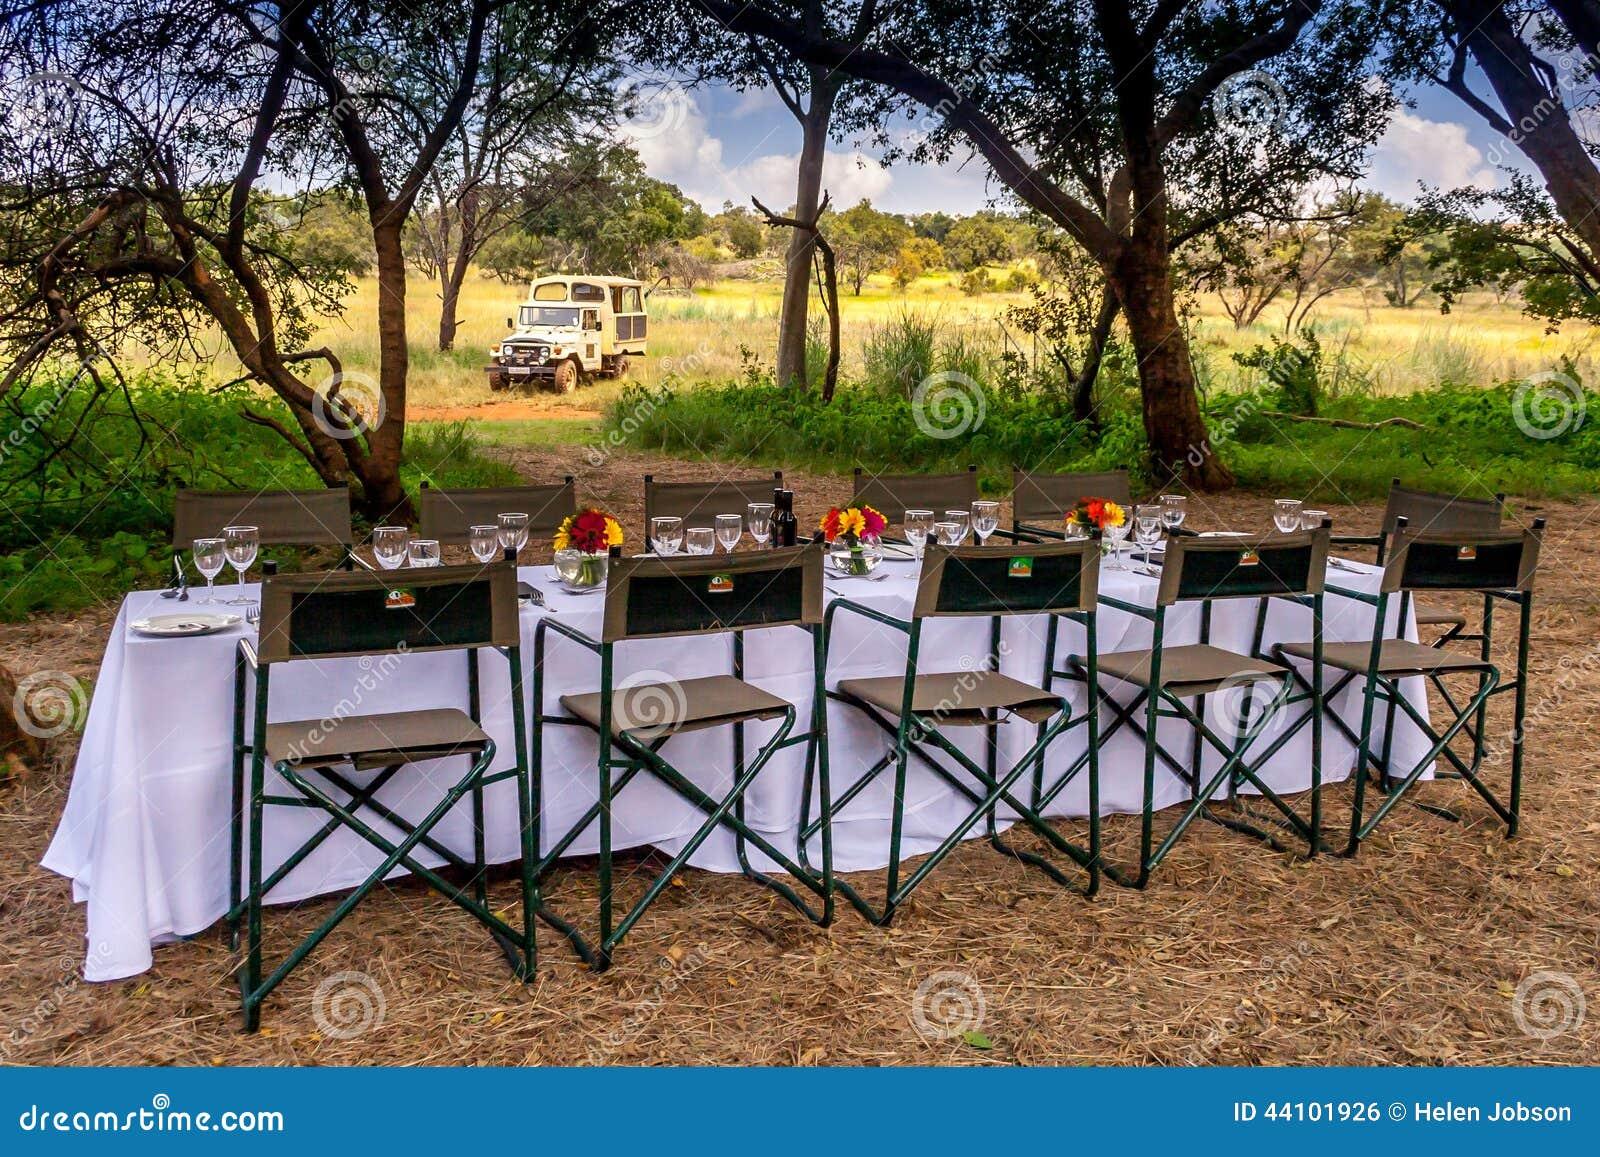 Safari Breakfast 3361